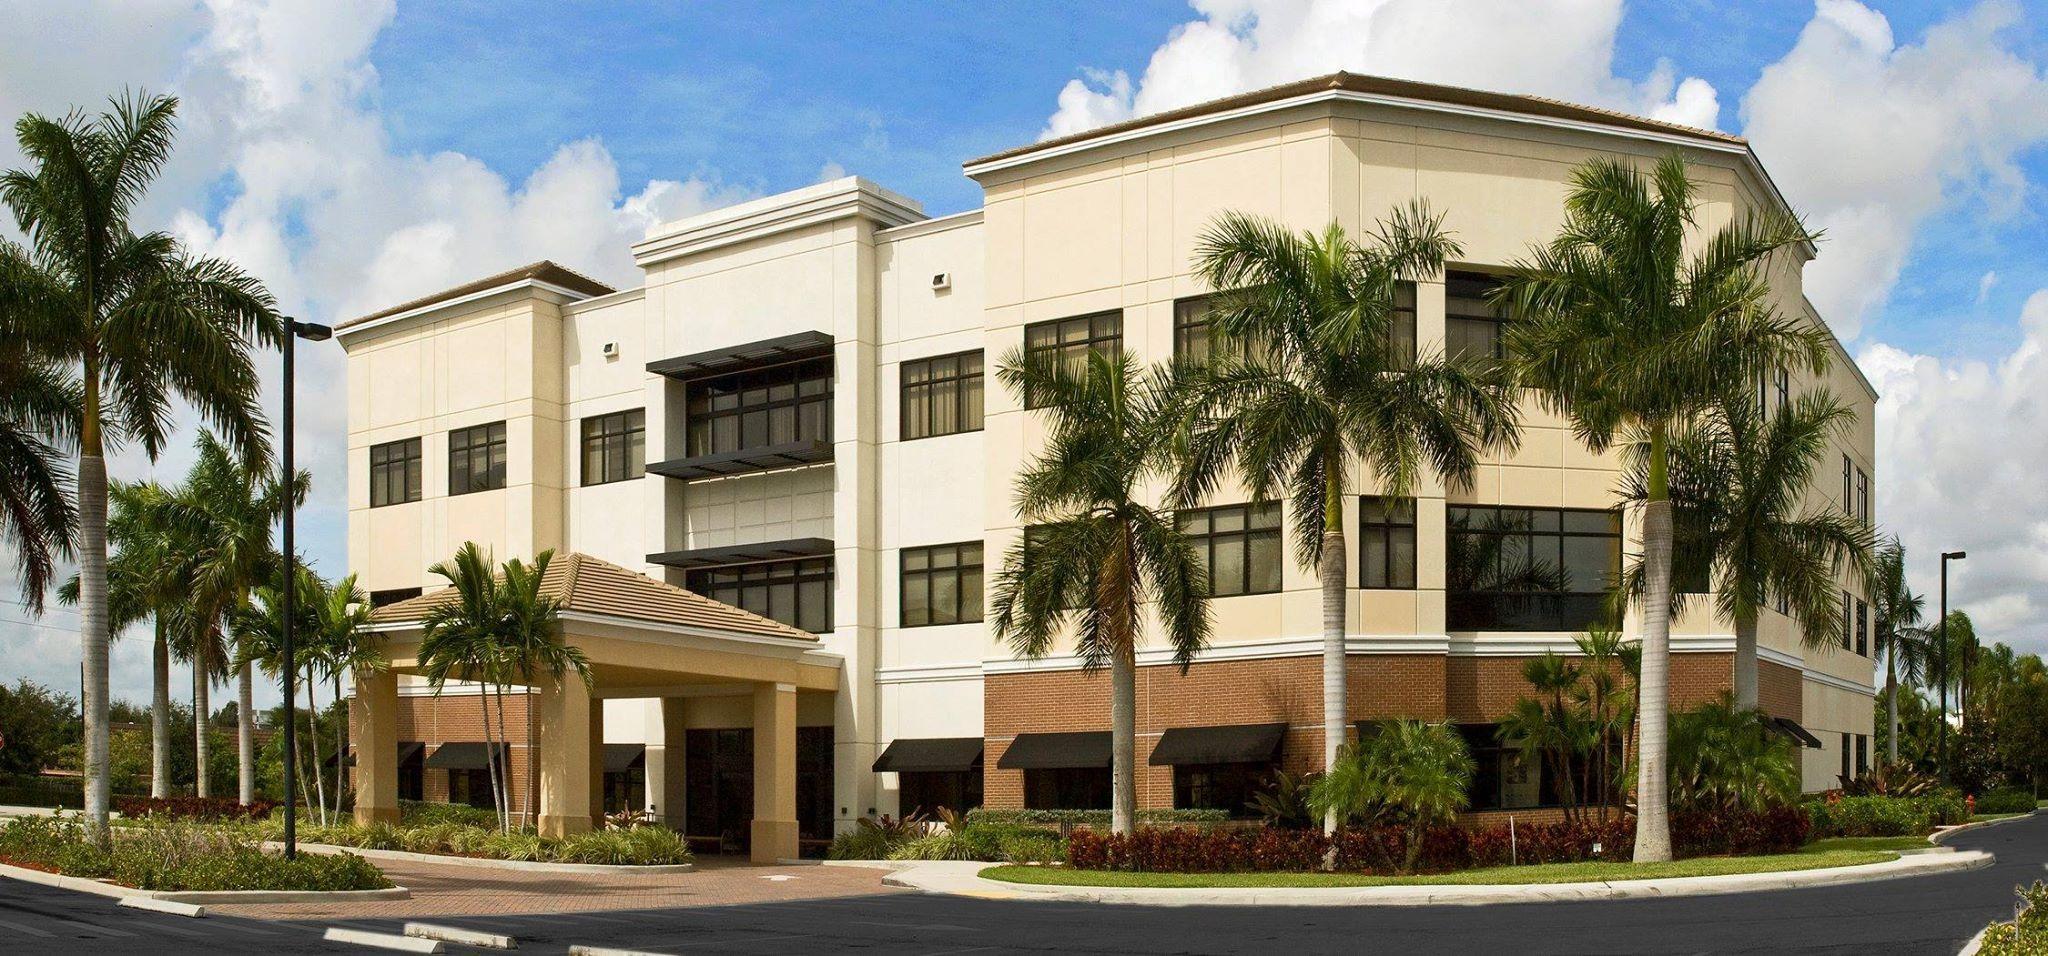 Orthopedic Center Of Palm Beach Fl